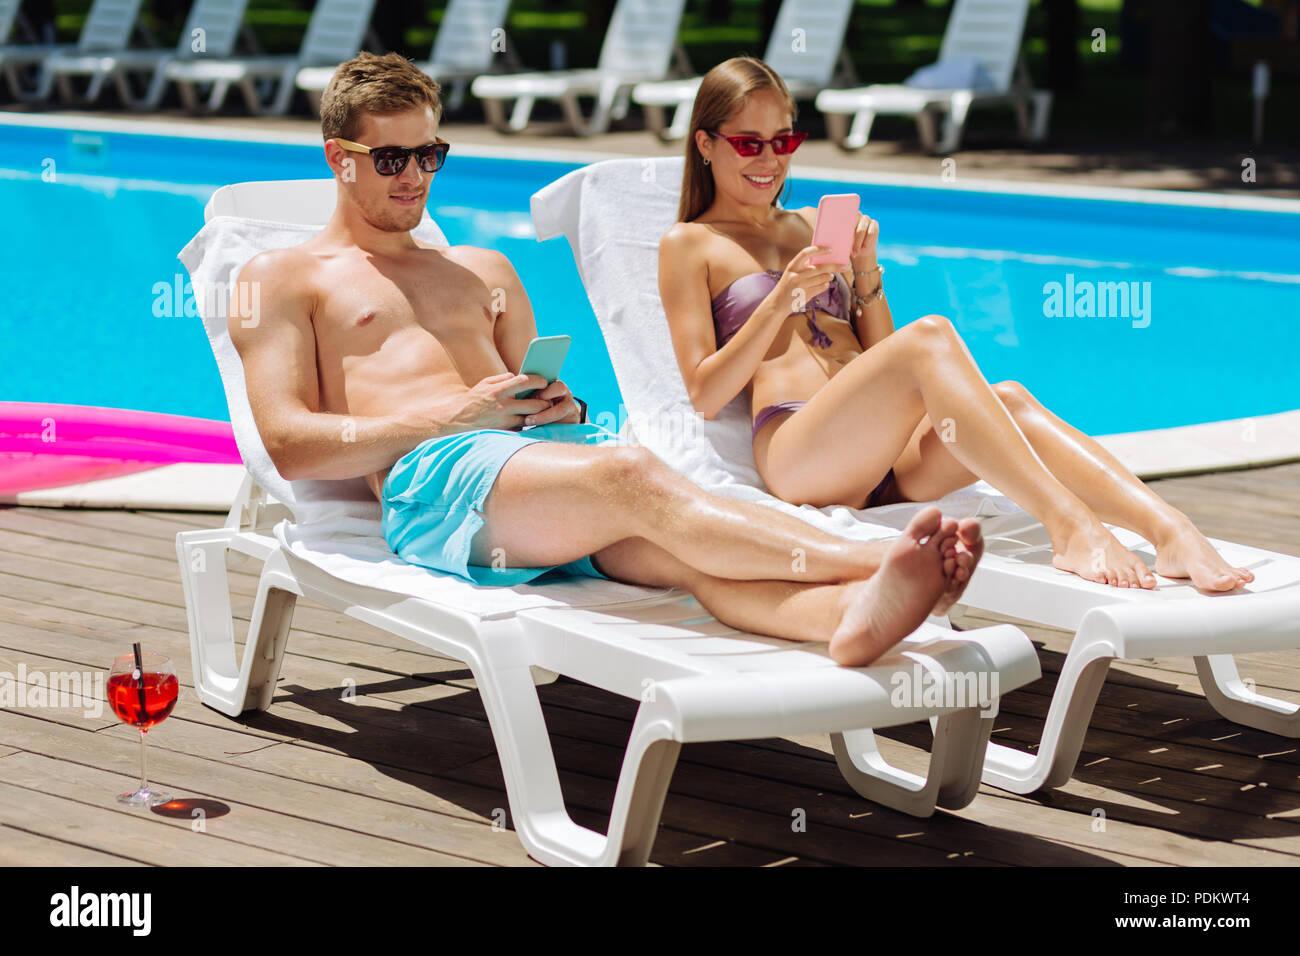 Modern boyfriend and girlfriend using their phones sunbathing - Stock Image